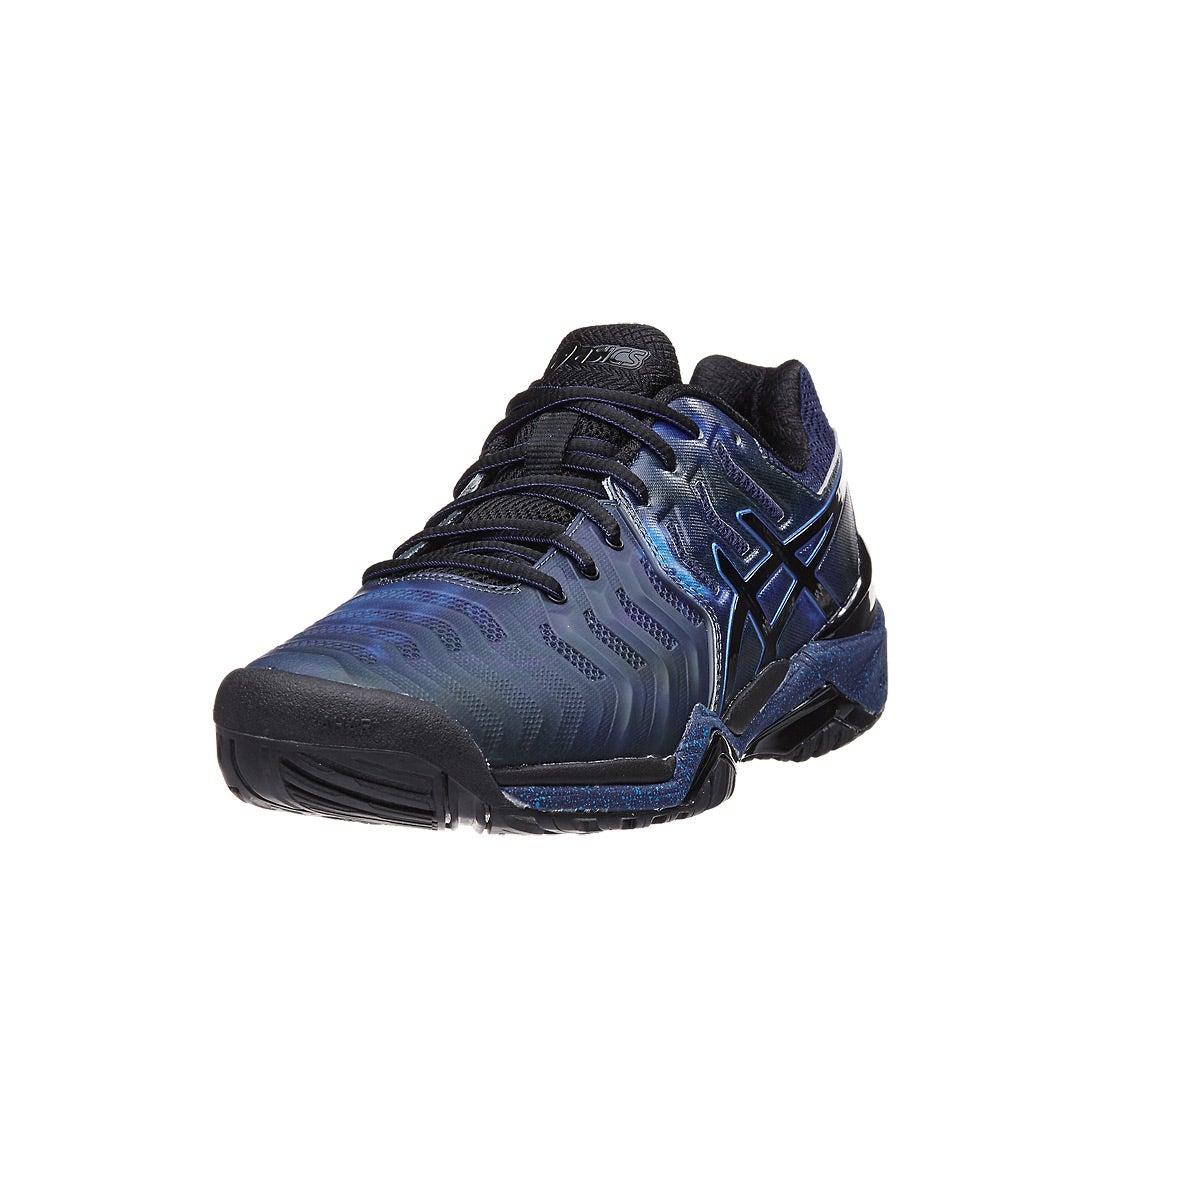 Asics Gel Resolution 7 Winter Solstice Men's Shoes 360° View